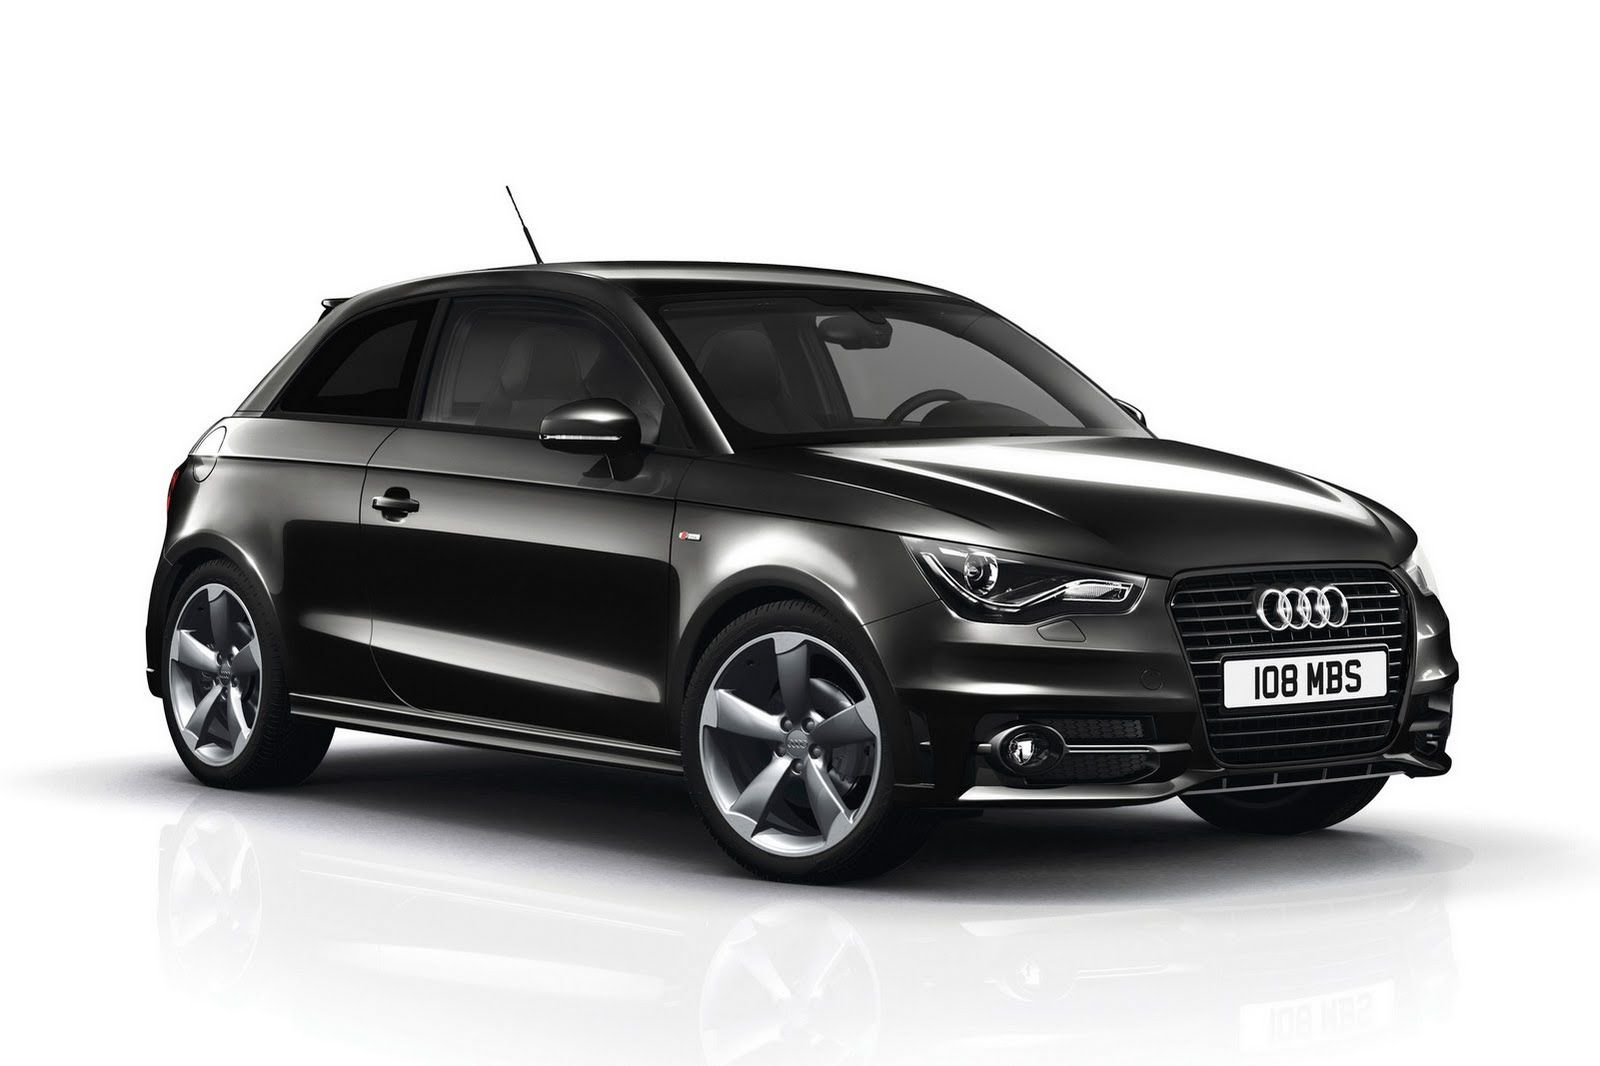 Audi A1 S Line Black Edition 2011 Auto Rijden Oldtimers